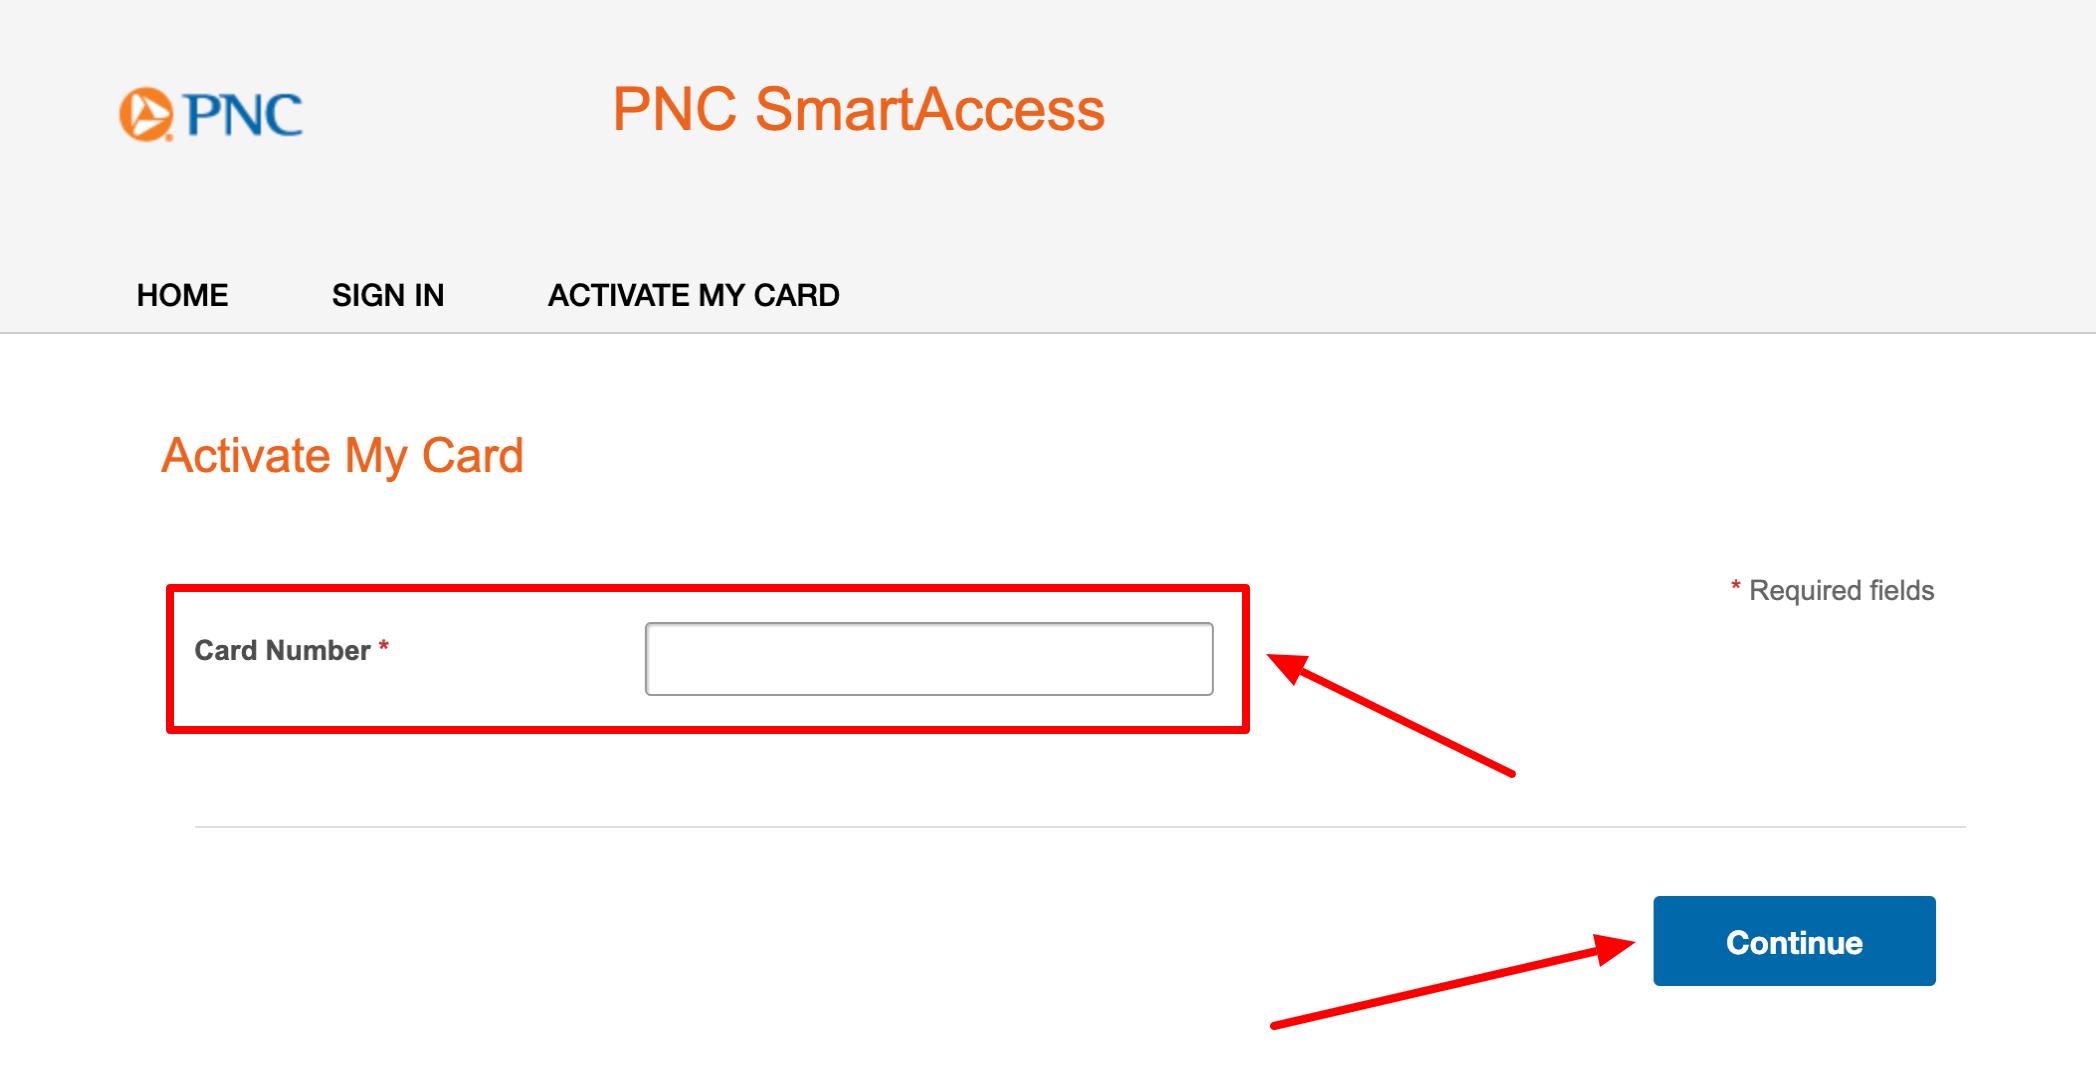 PNC SmartAccess Activate My Card